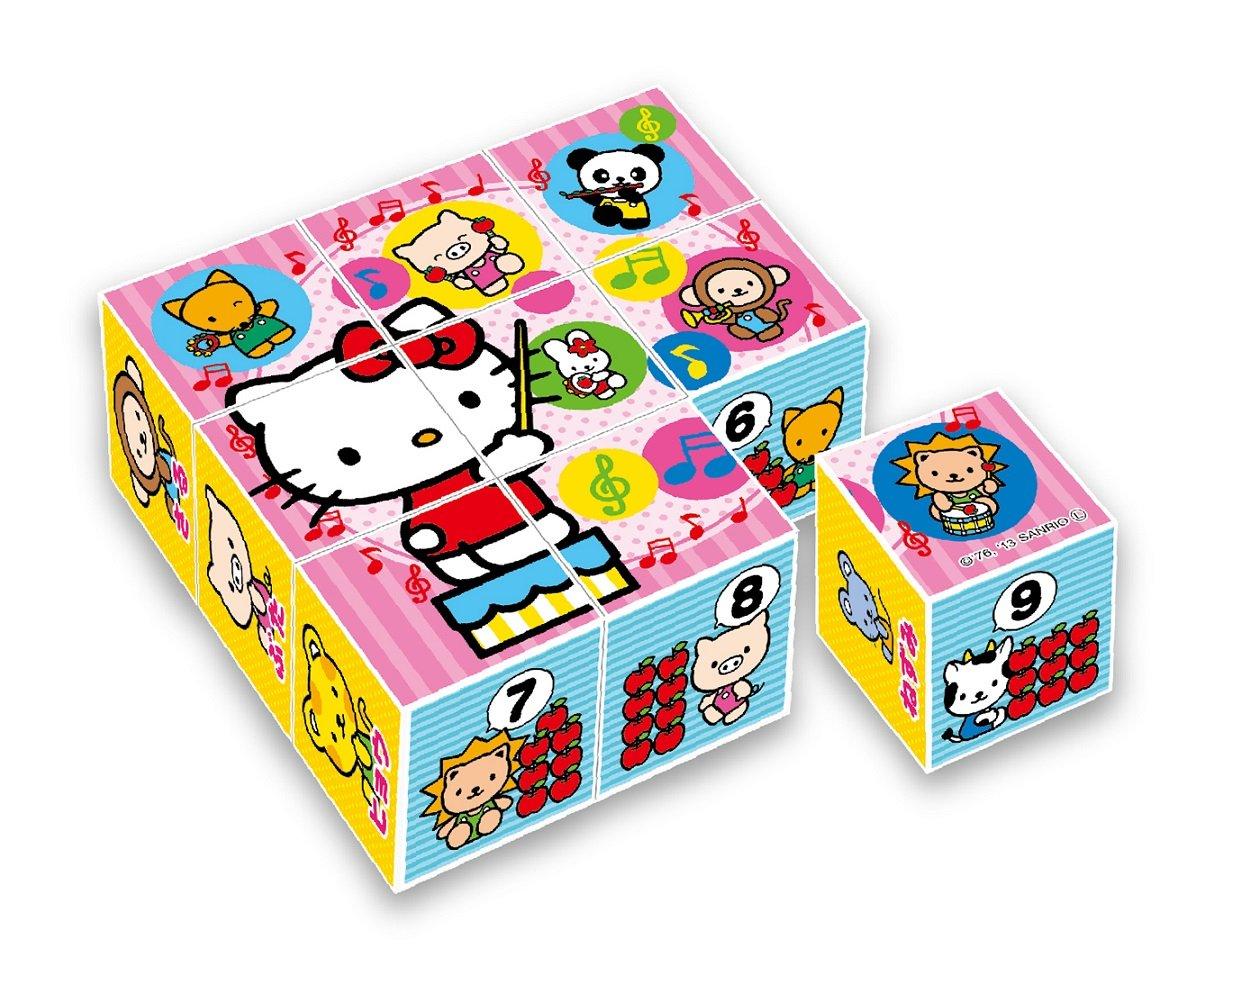 Amazoncom Hello Kitty Cube Puzzle 9 Frame Japan Import Toys Games